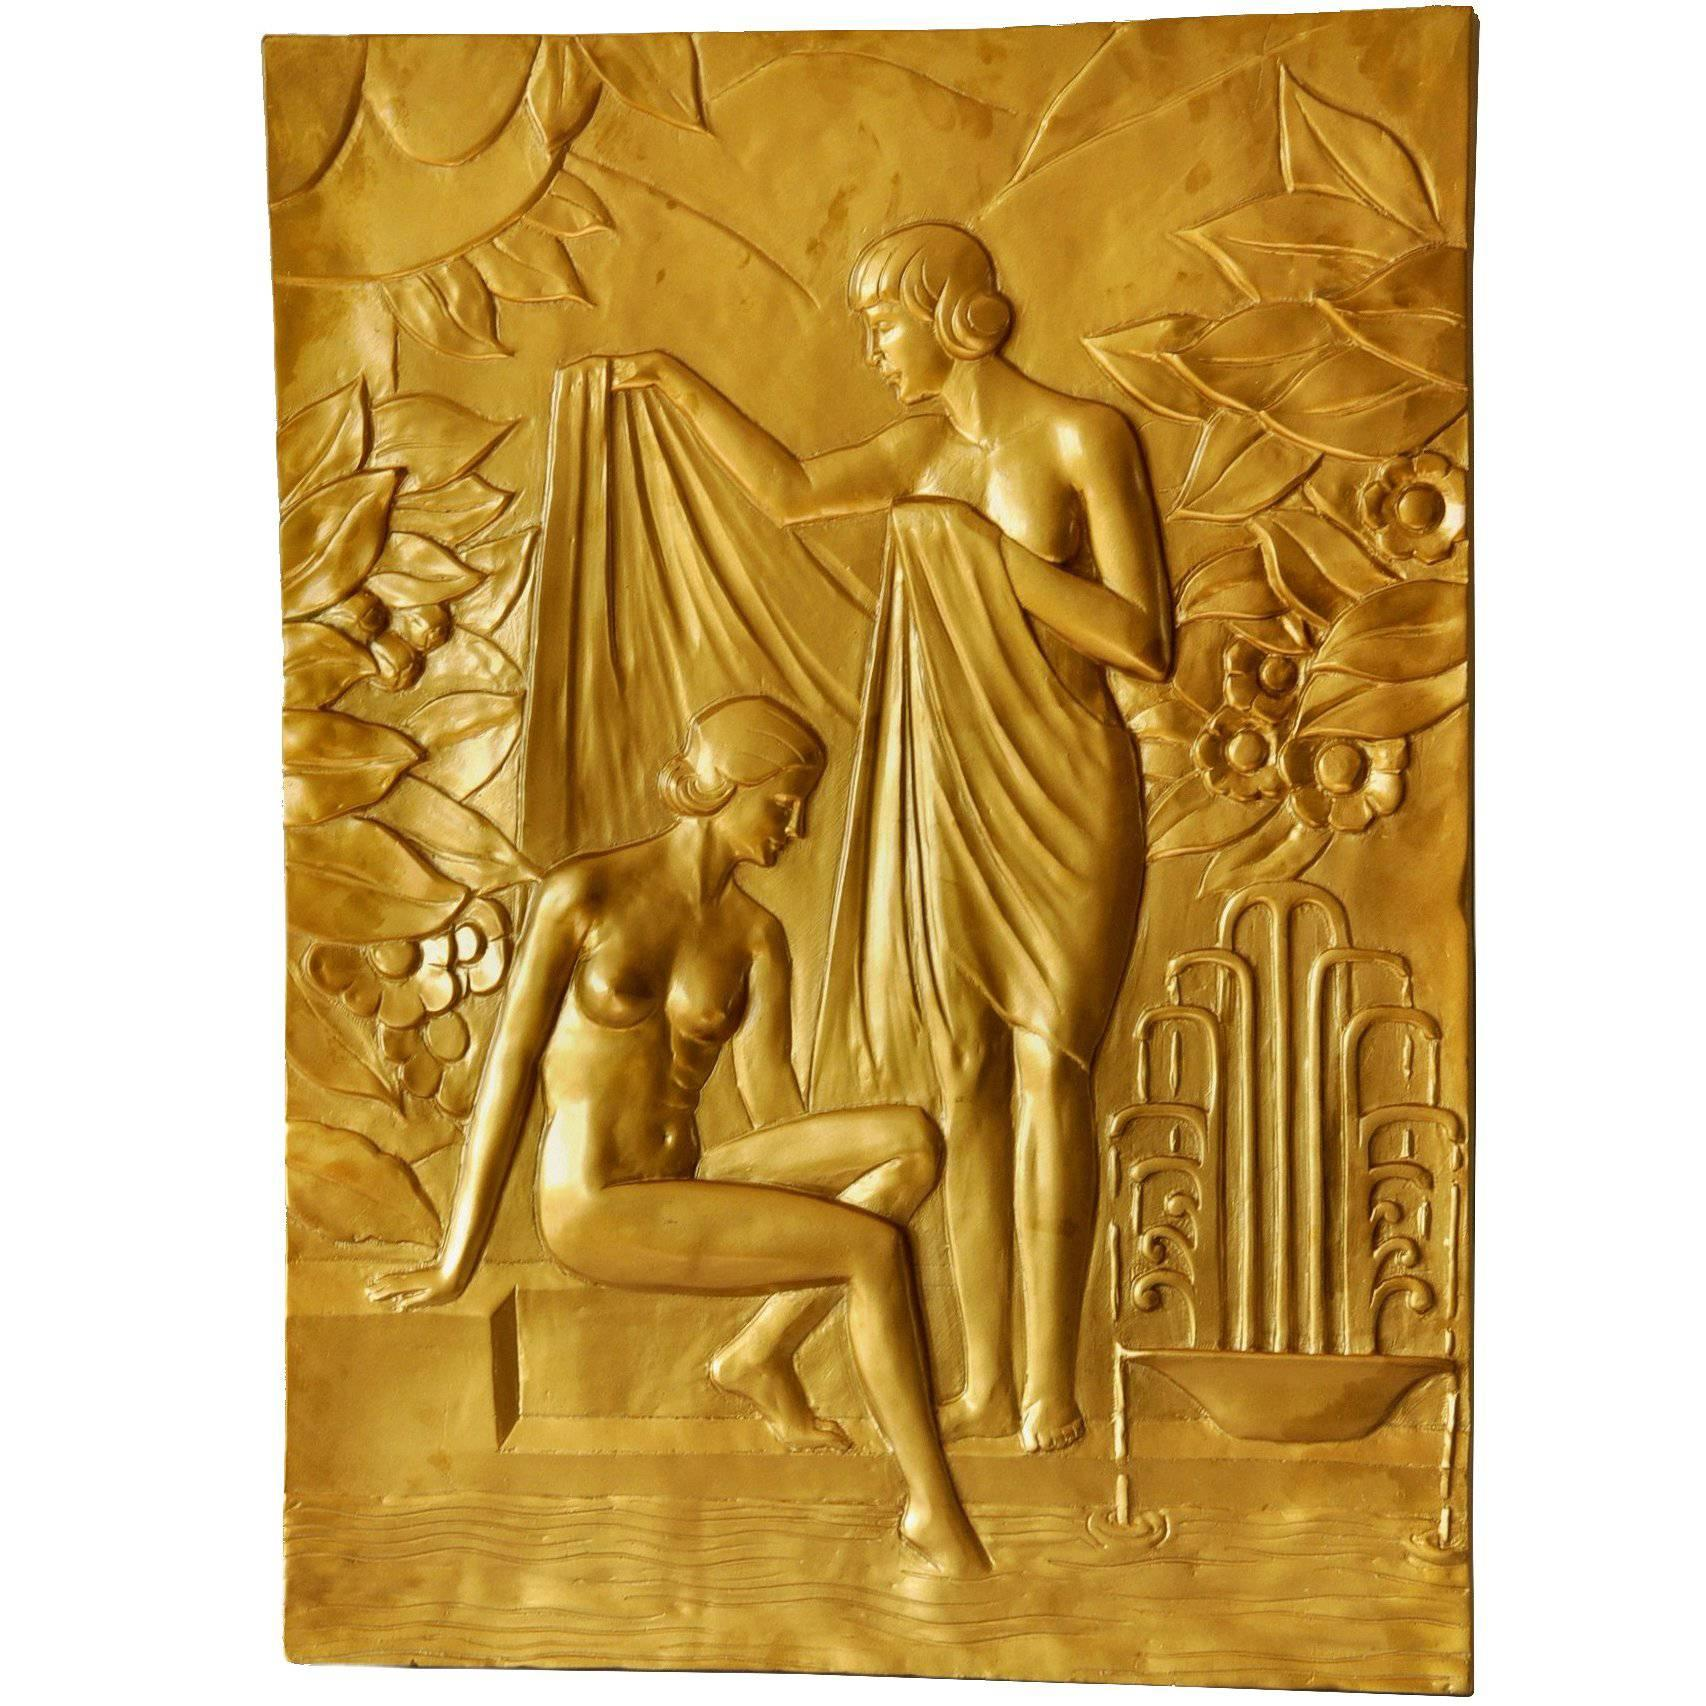 Important Art Deco Mythological Gilt Wall Plaque For Sale at 1stdibs